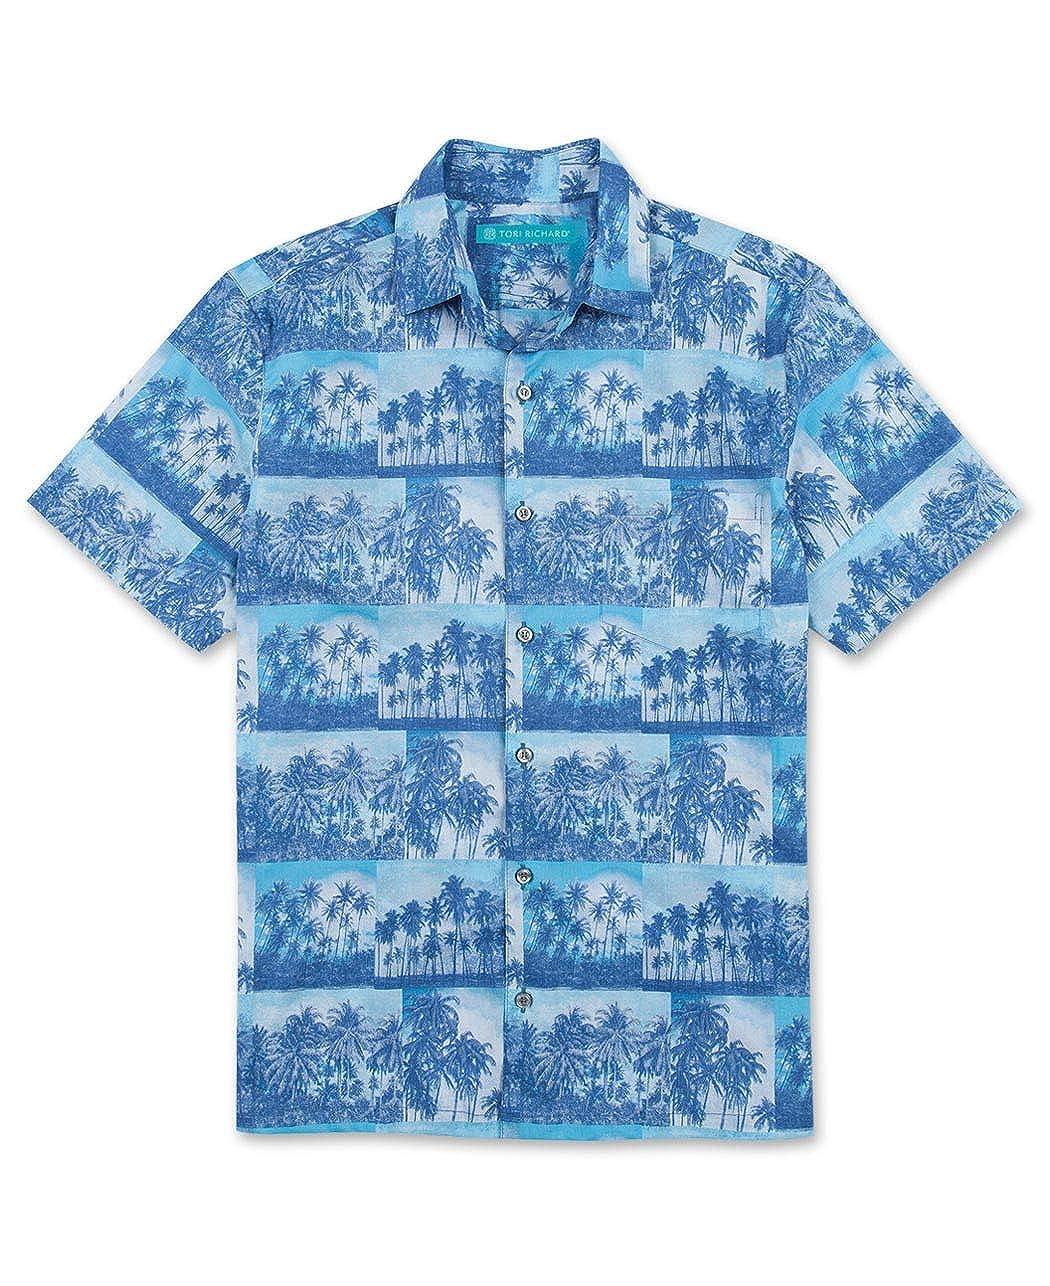 Tori Richard Big and Tall Kodachrome Hawaiian Camp Shirt